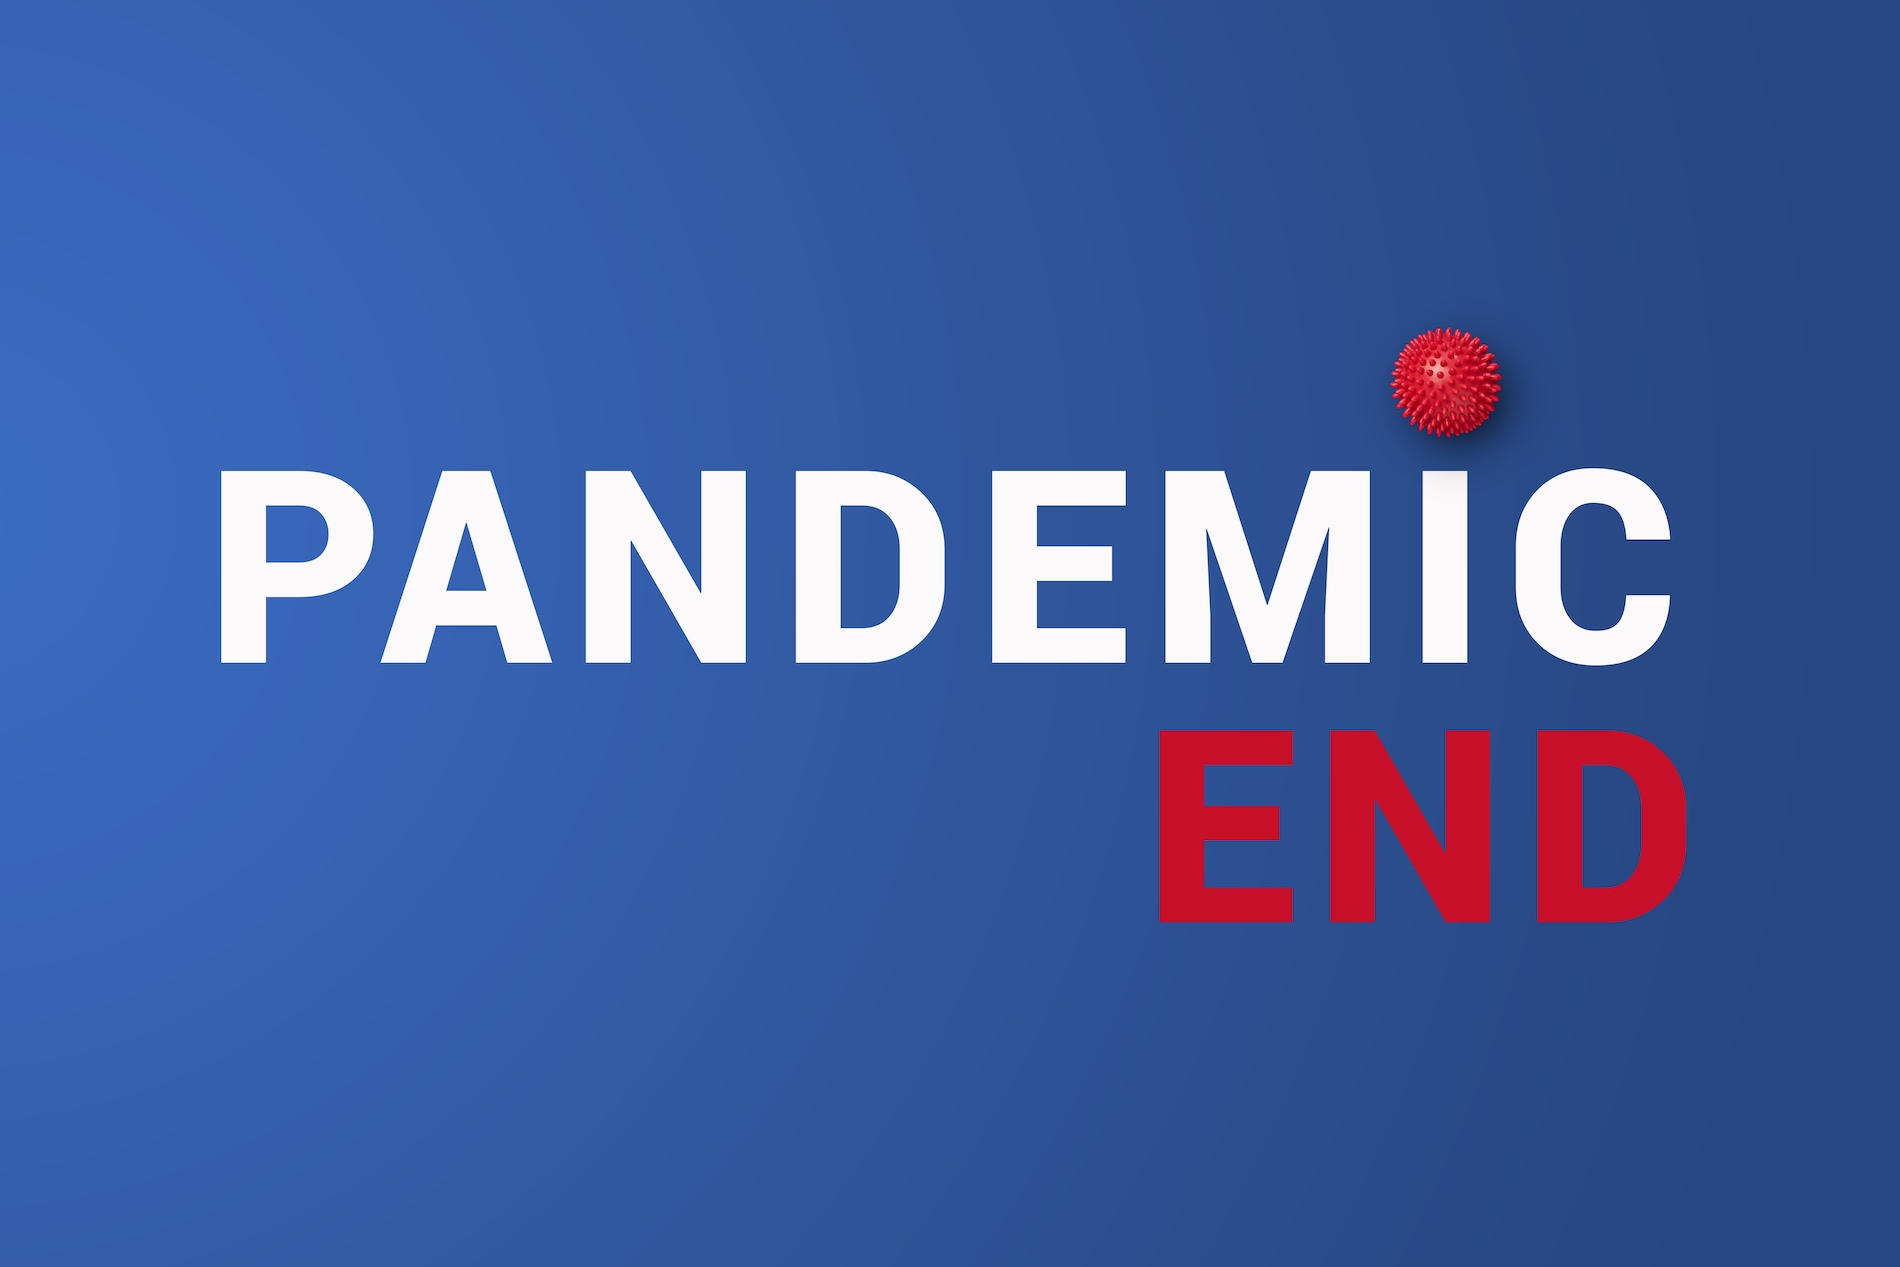 A $50 billion roadmap put forward to end global pandemic